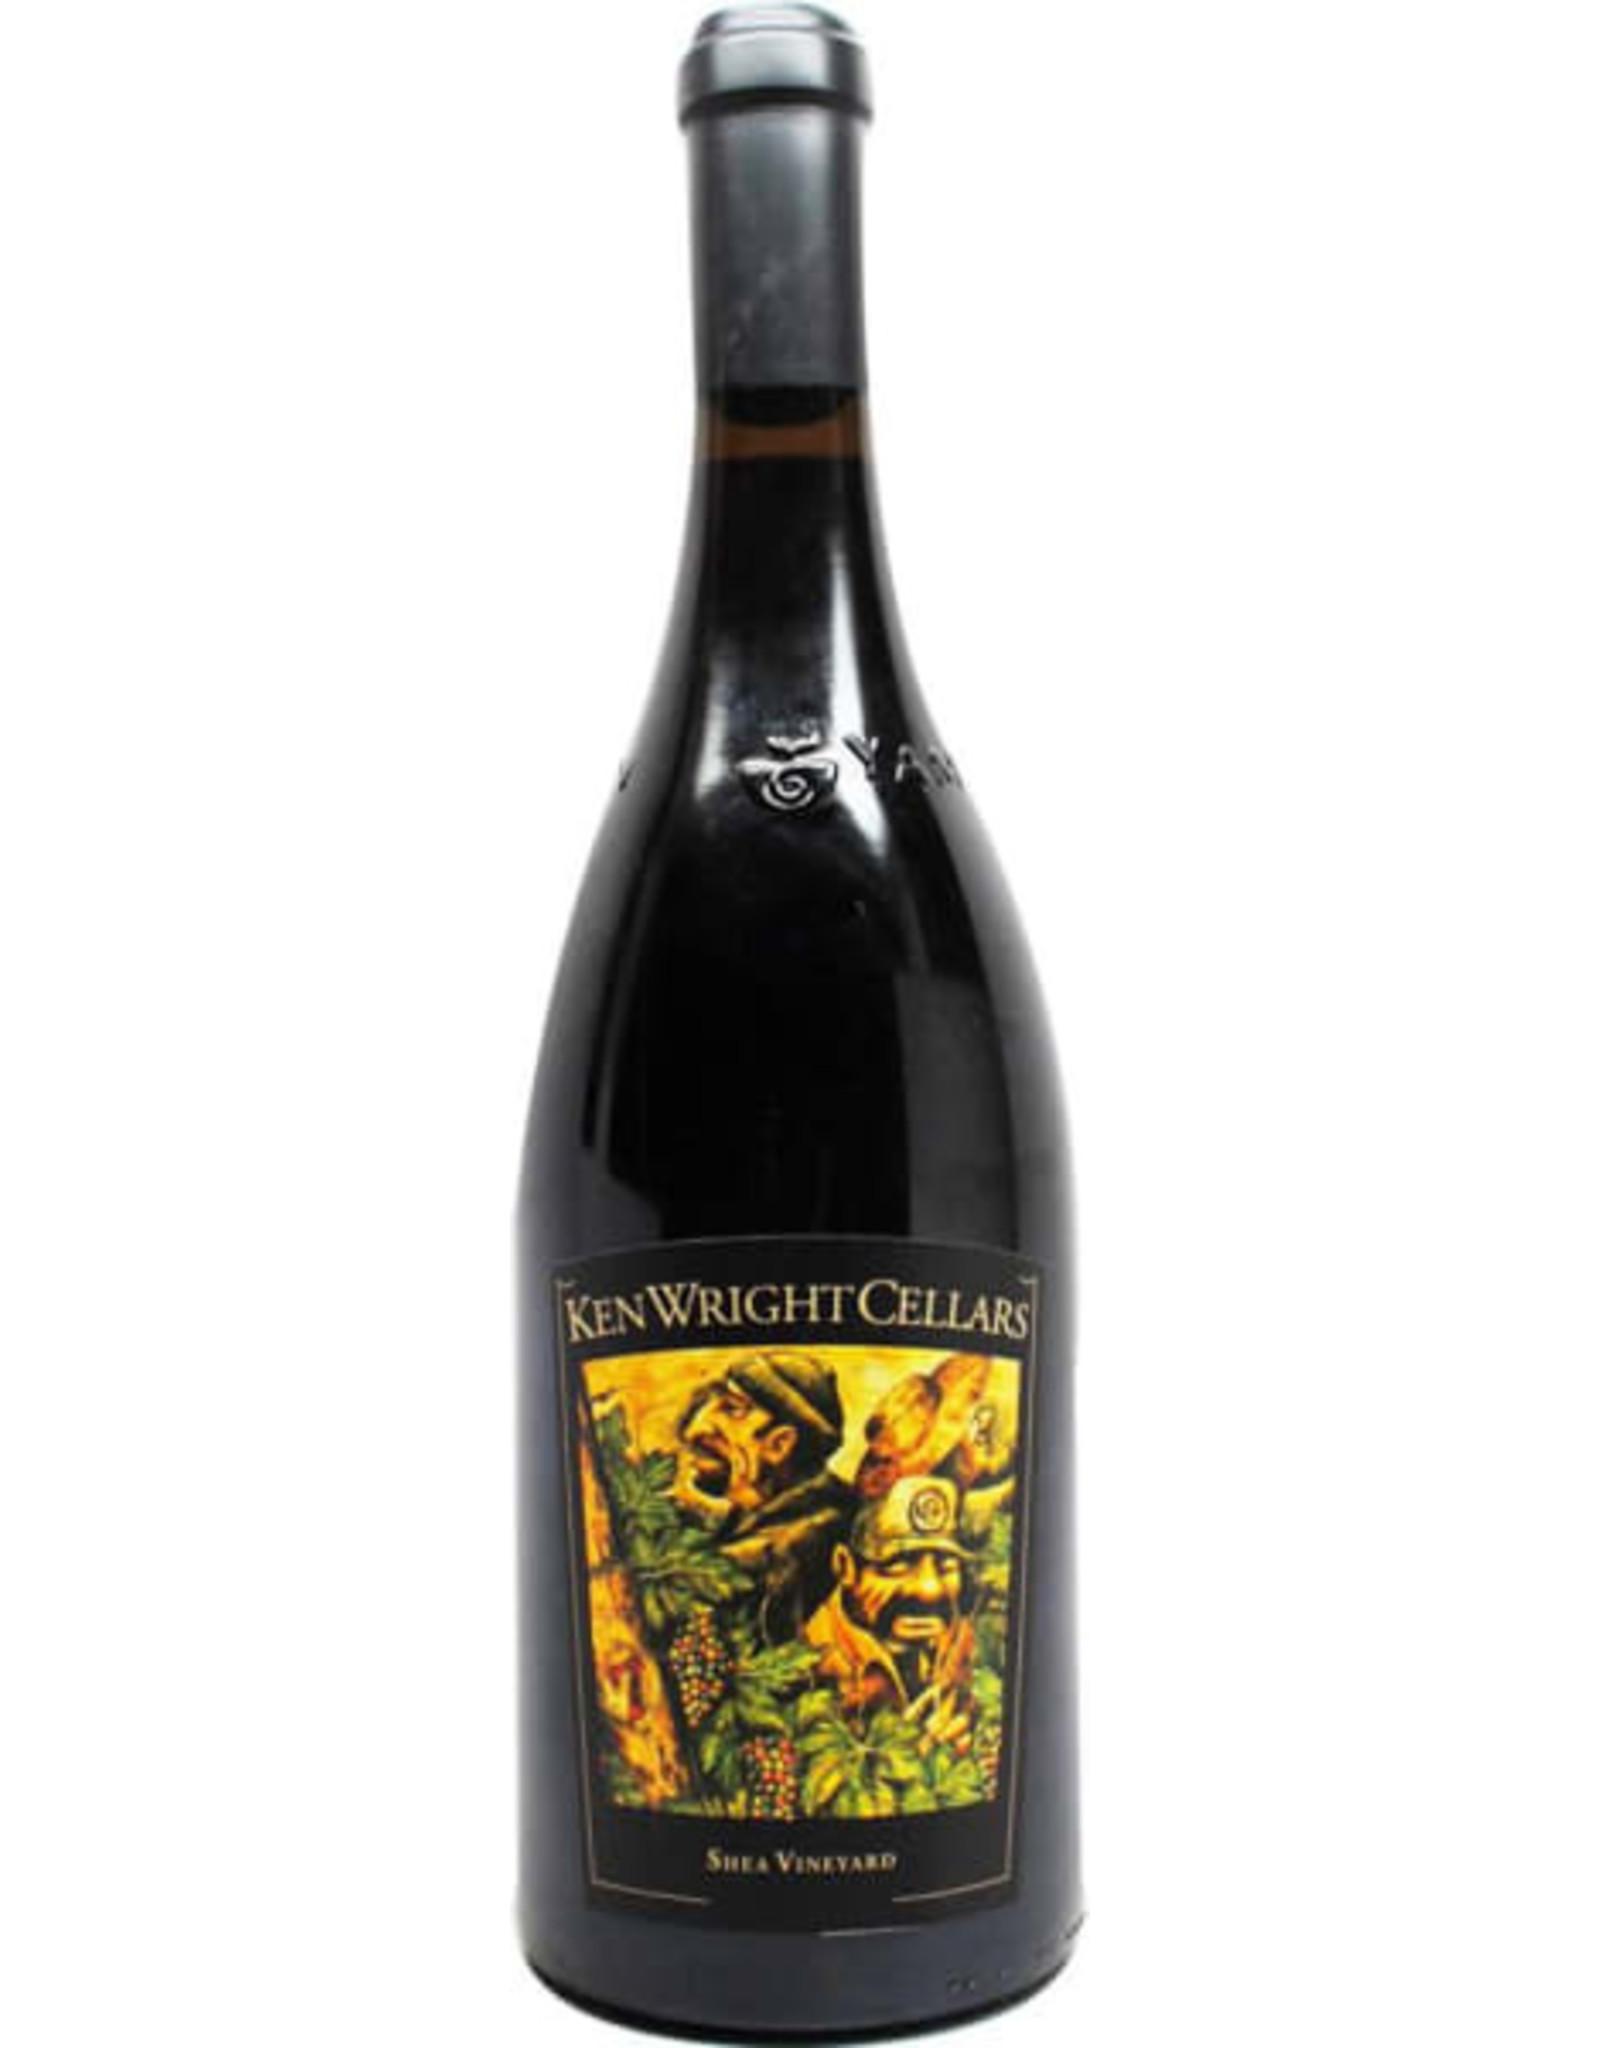 Ken Wright Cellars Ken Wright Shea Vineyard Pinot Noir, Yam-Hill Carlton 2017